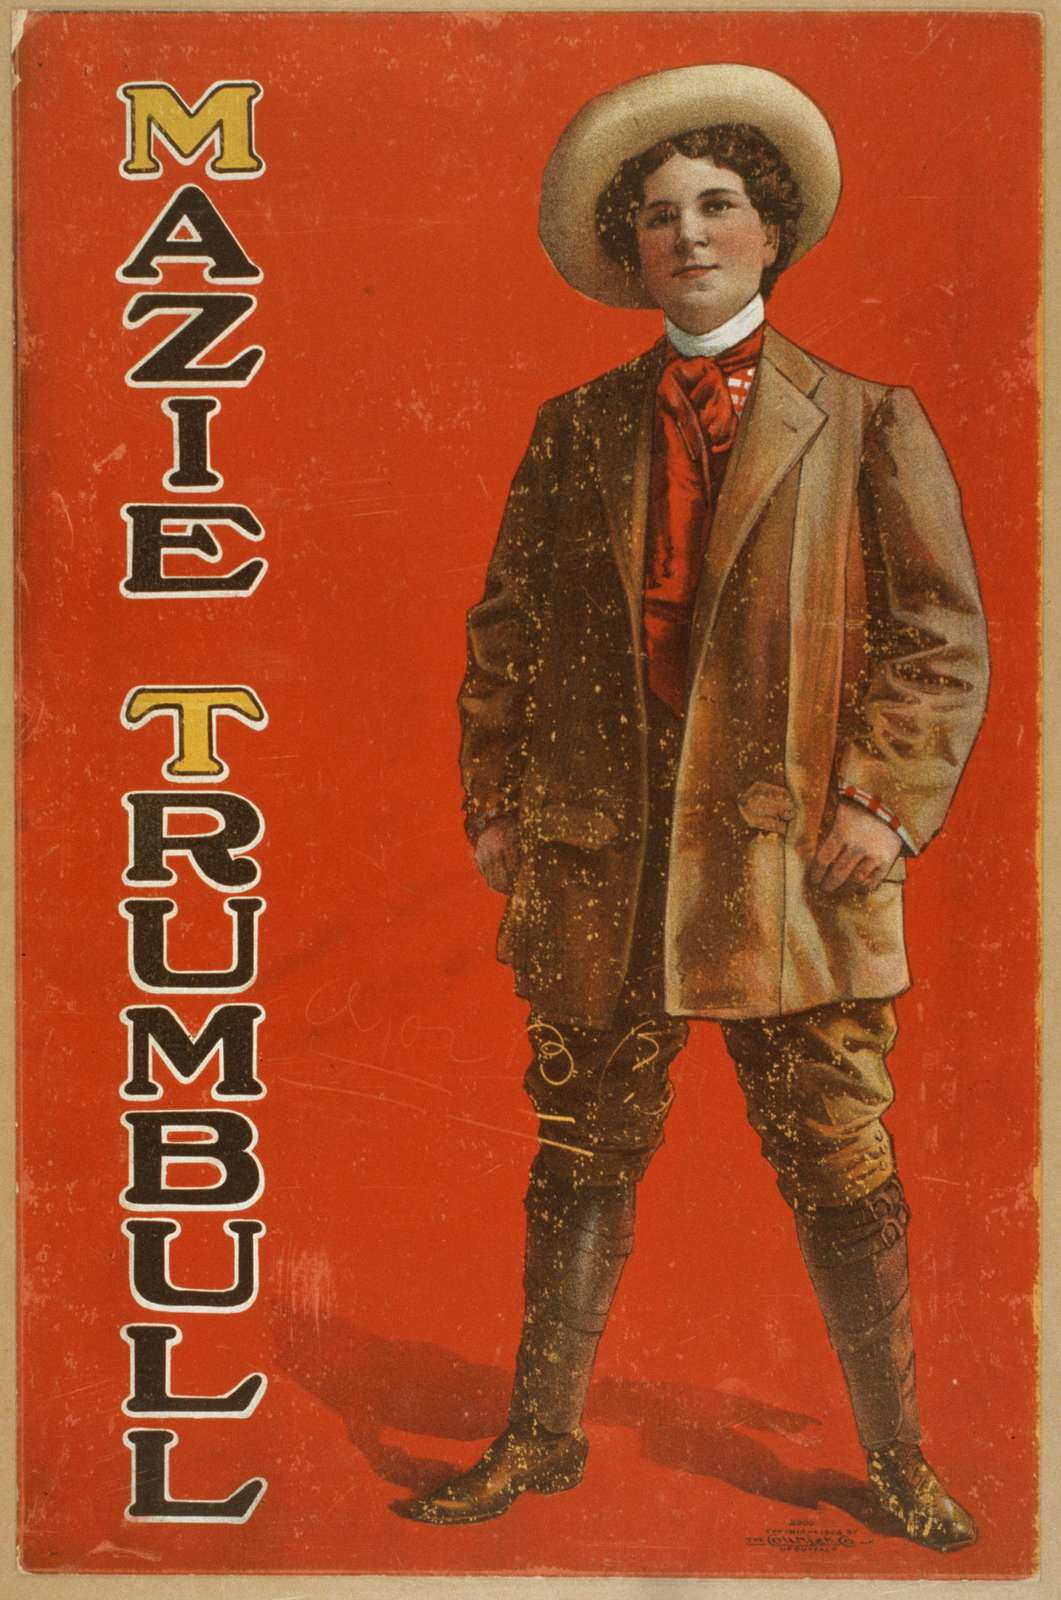 Mazie Trumbull